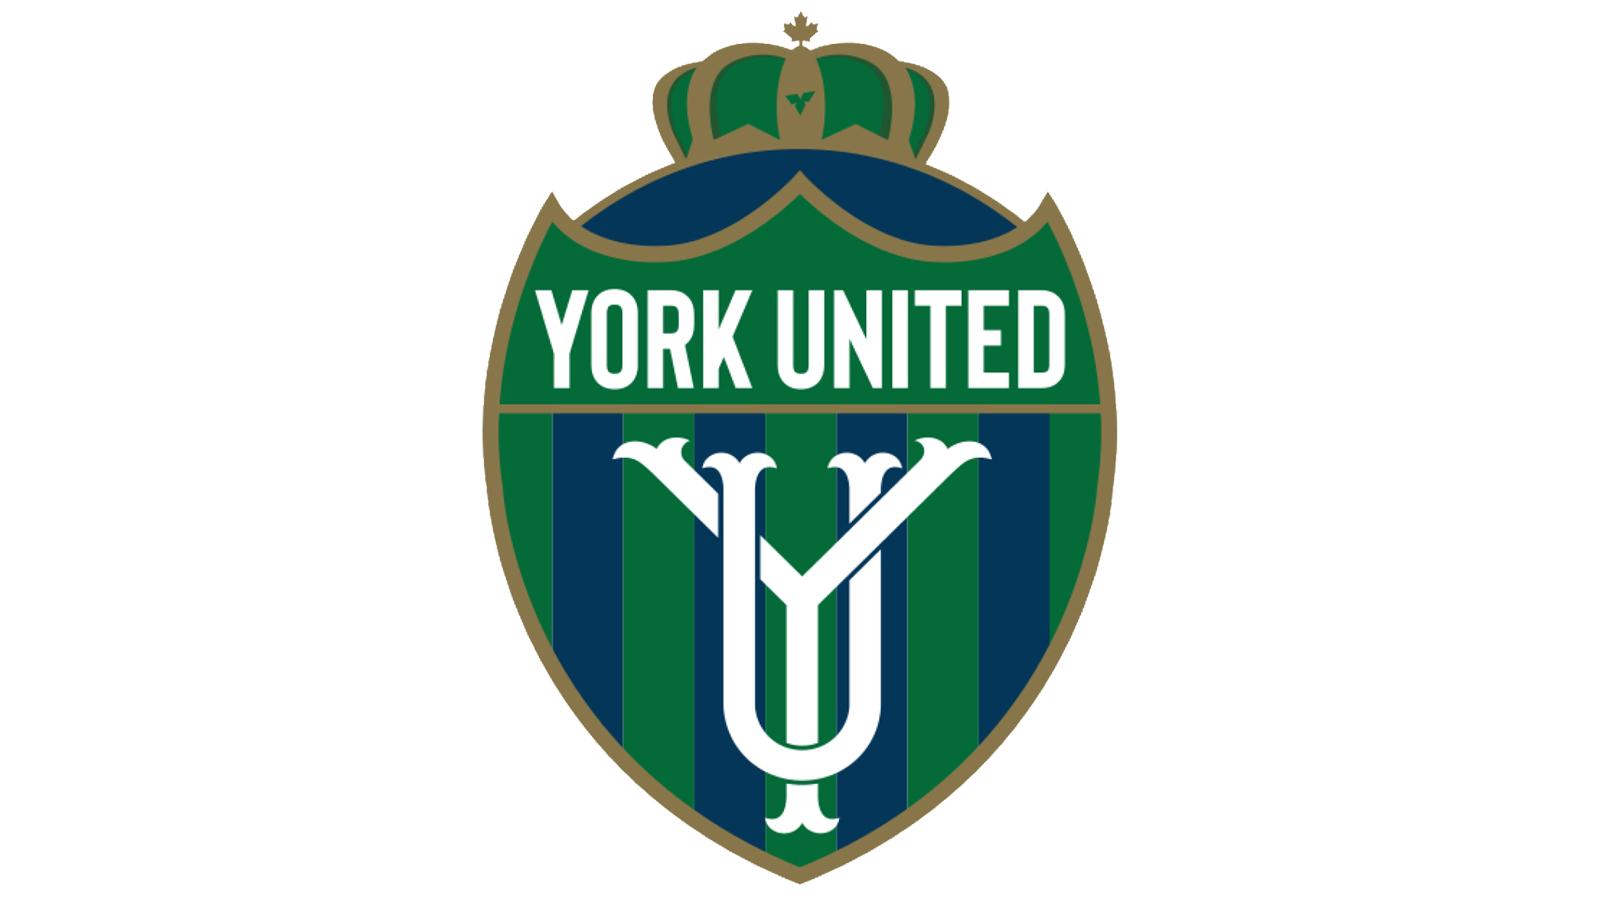 York United FC's new crest.